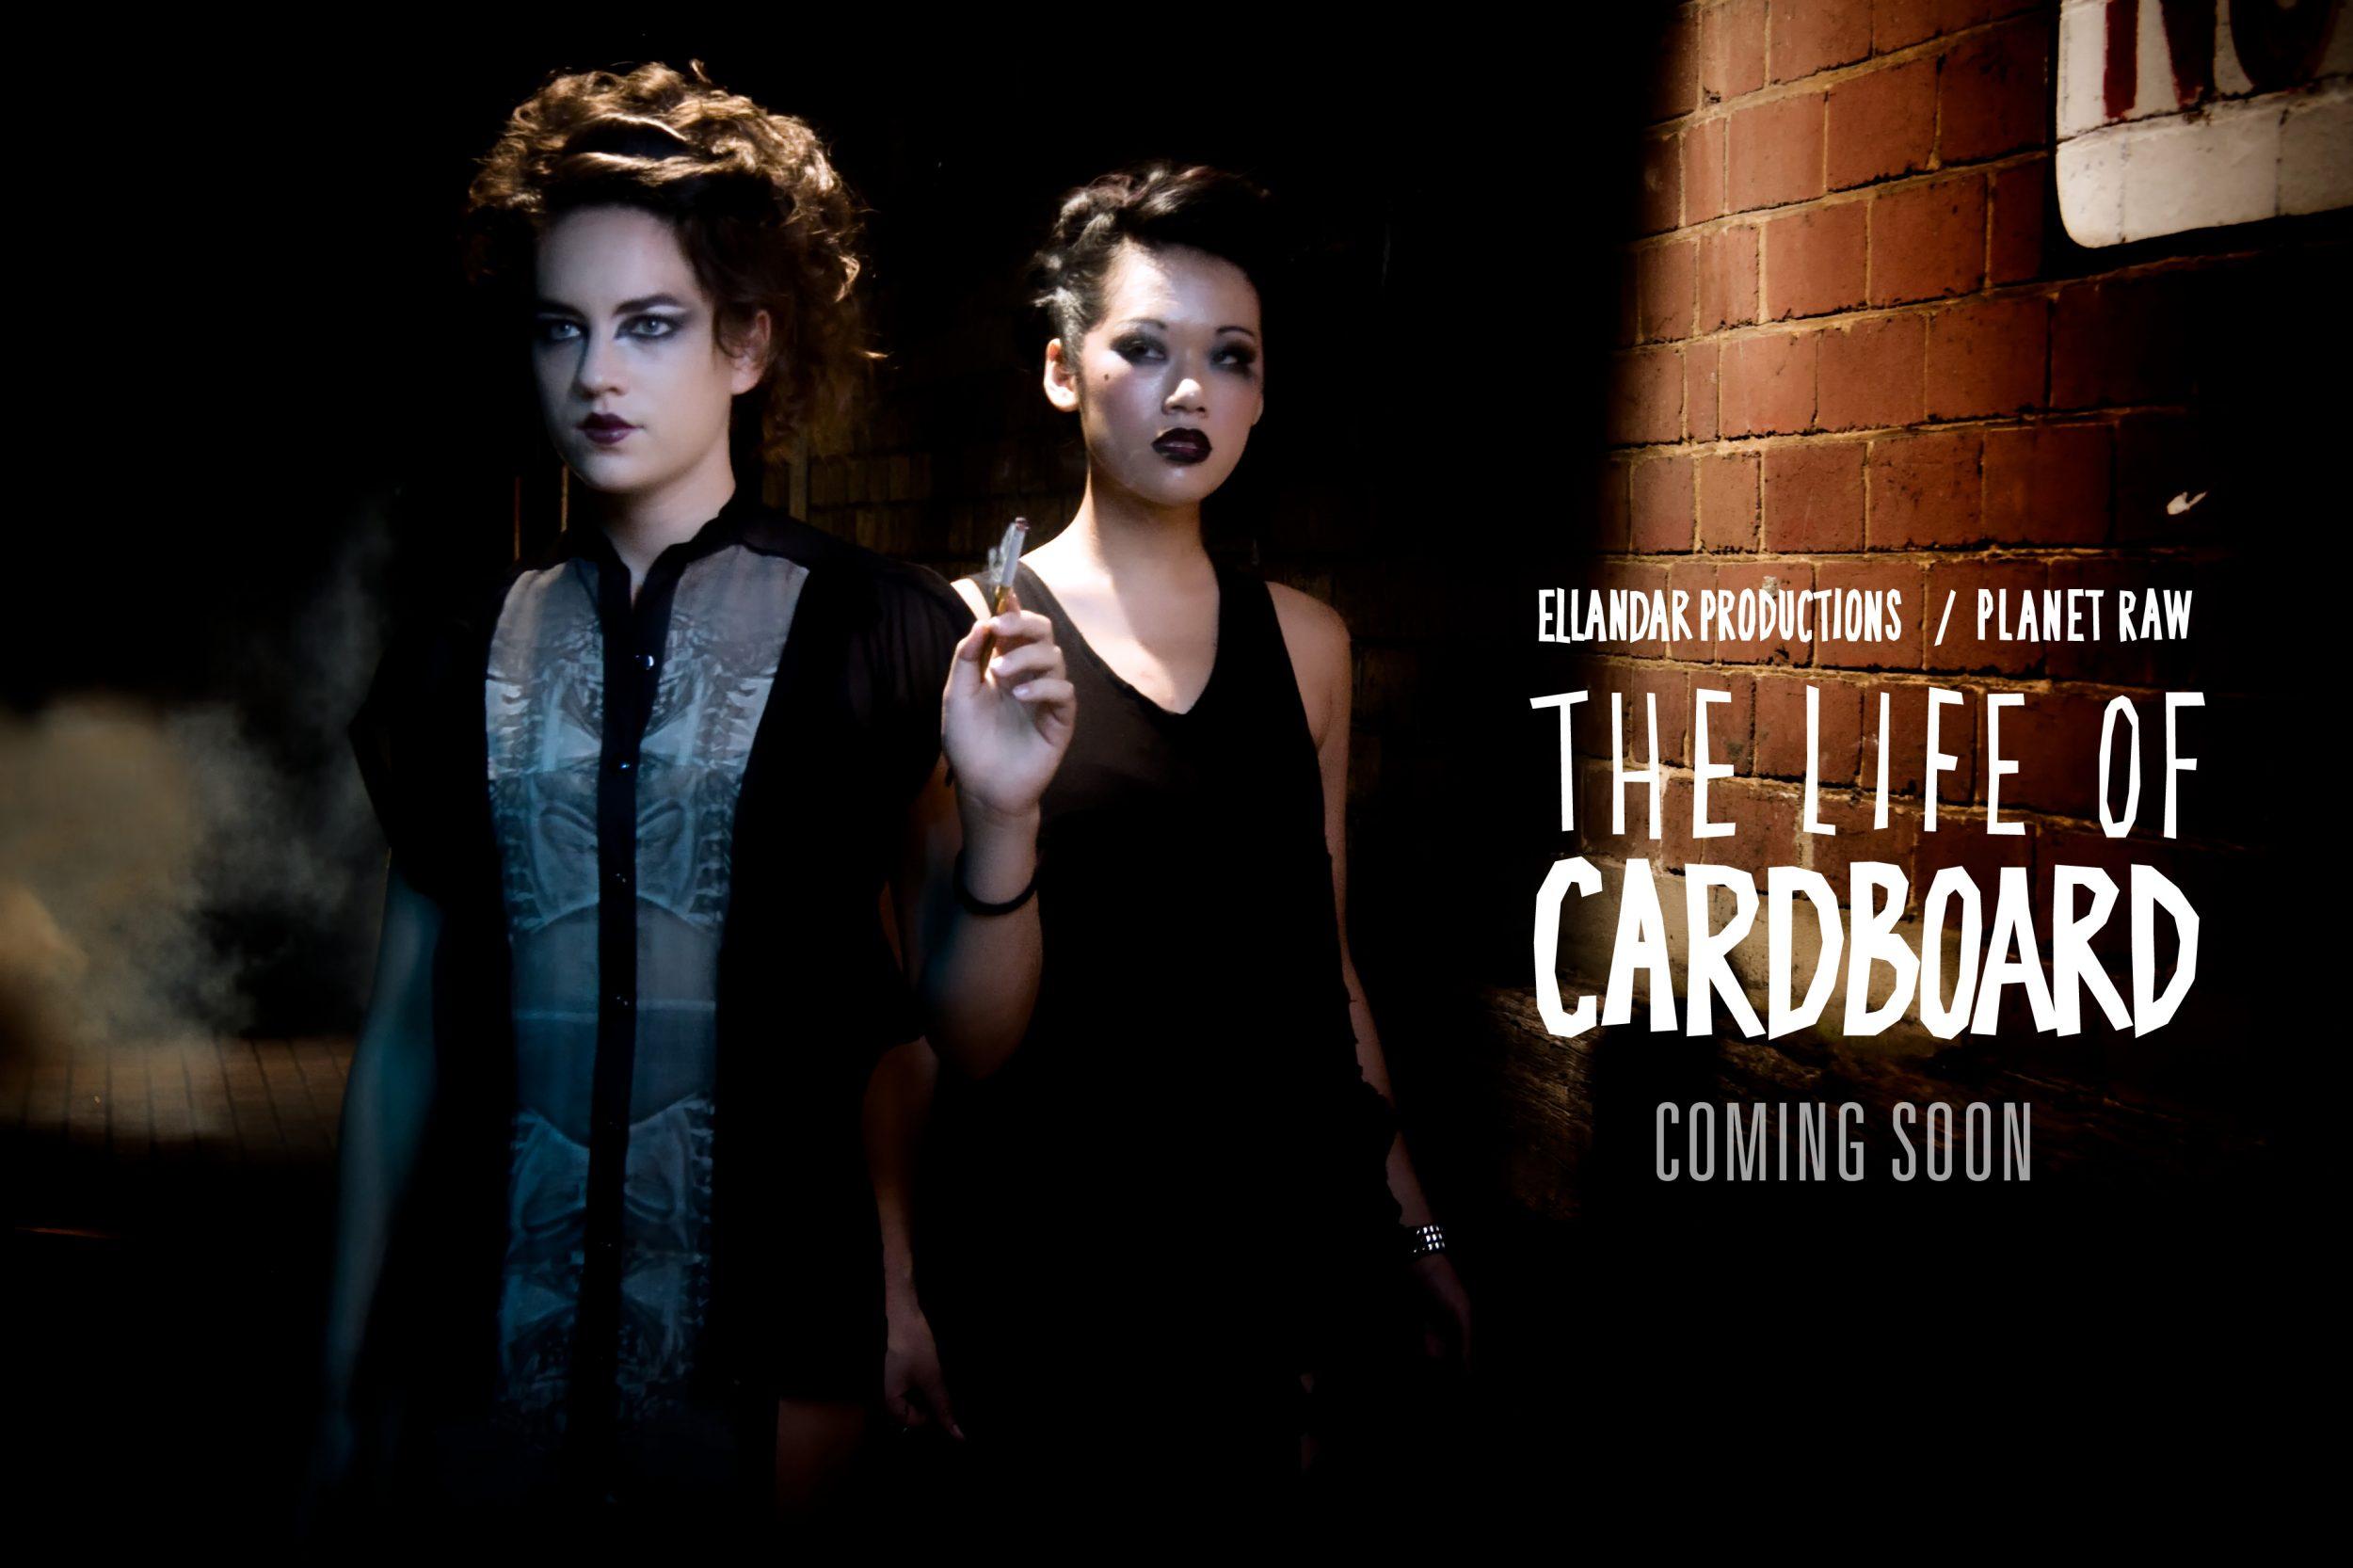 the-life-of-cardboard-4-1